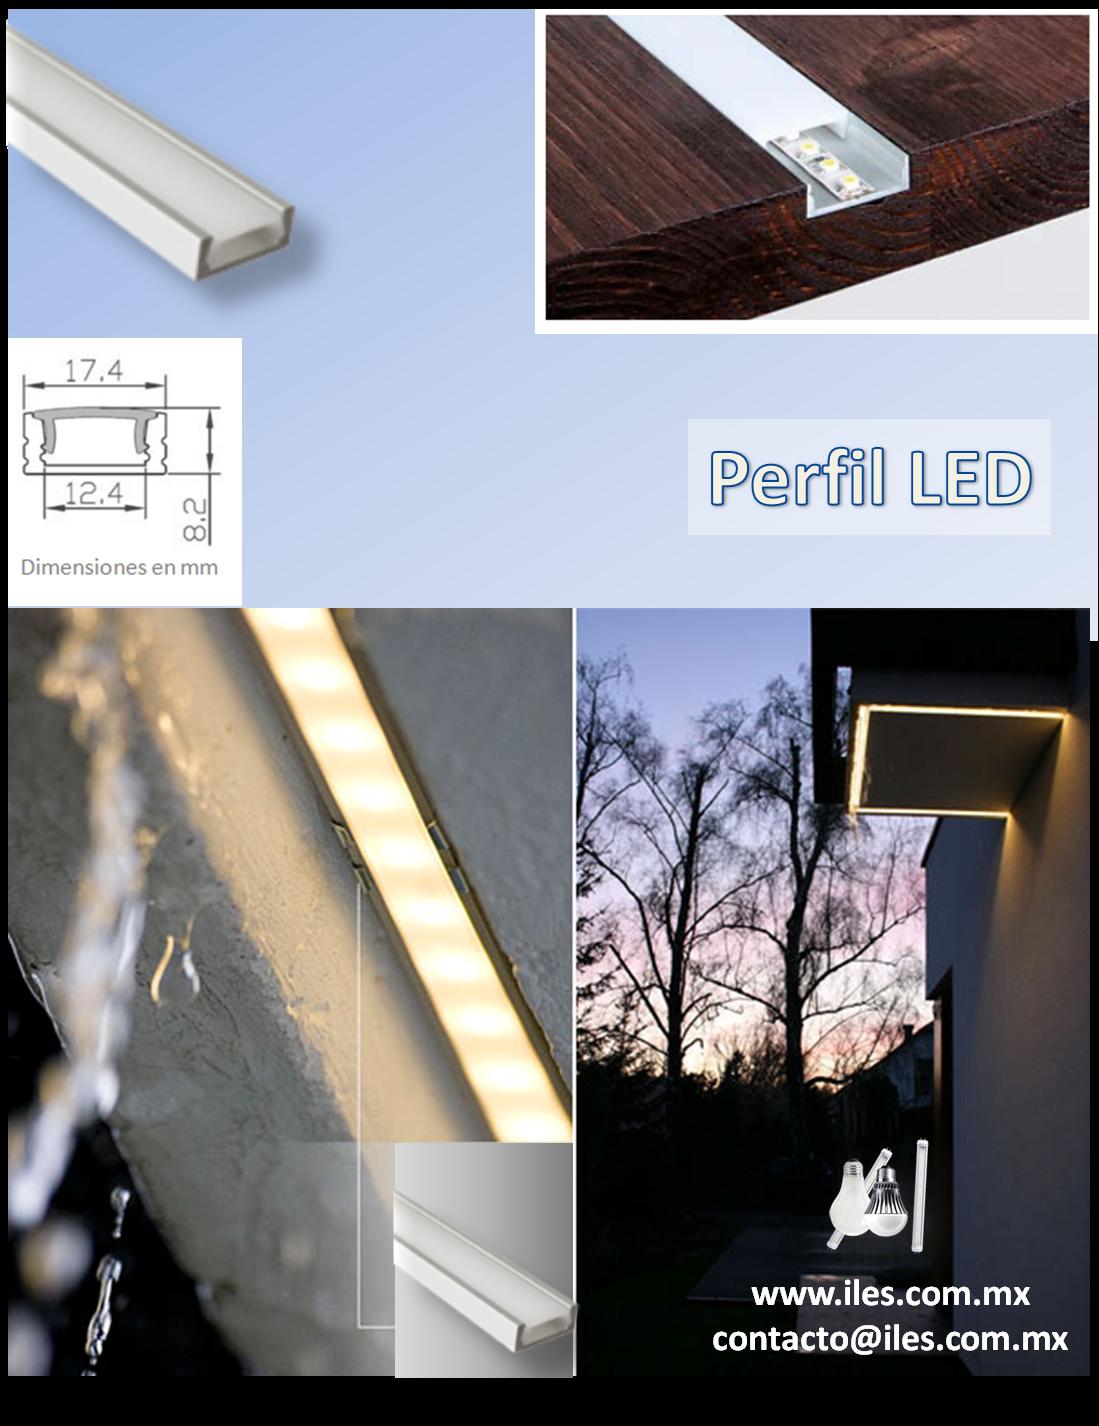 5 x 8 badezimmer design-ideen perfil led perfil de aluminio anodizado plata  x  mm